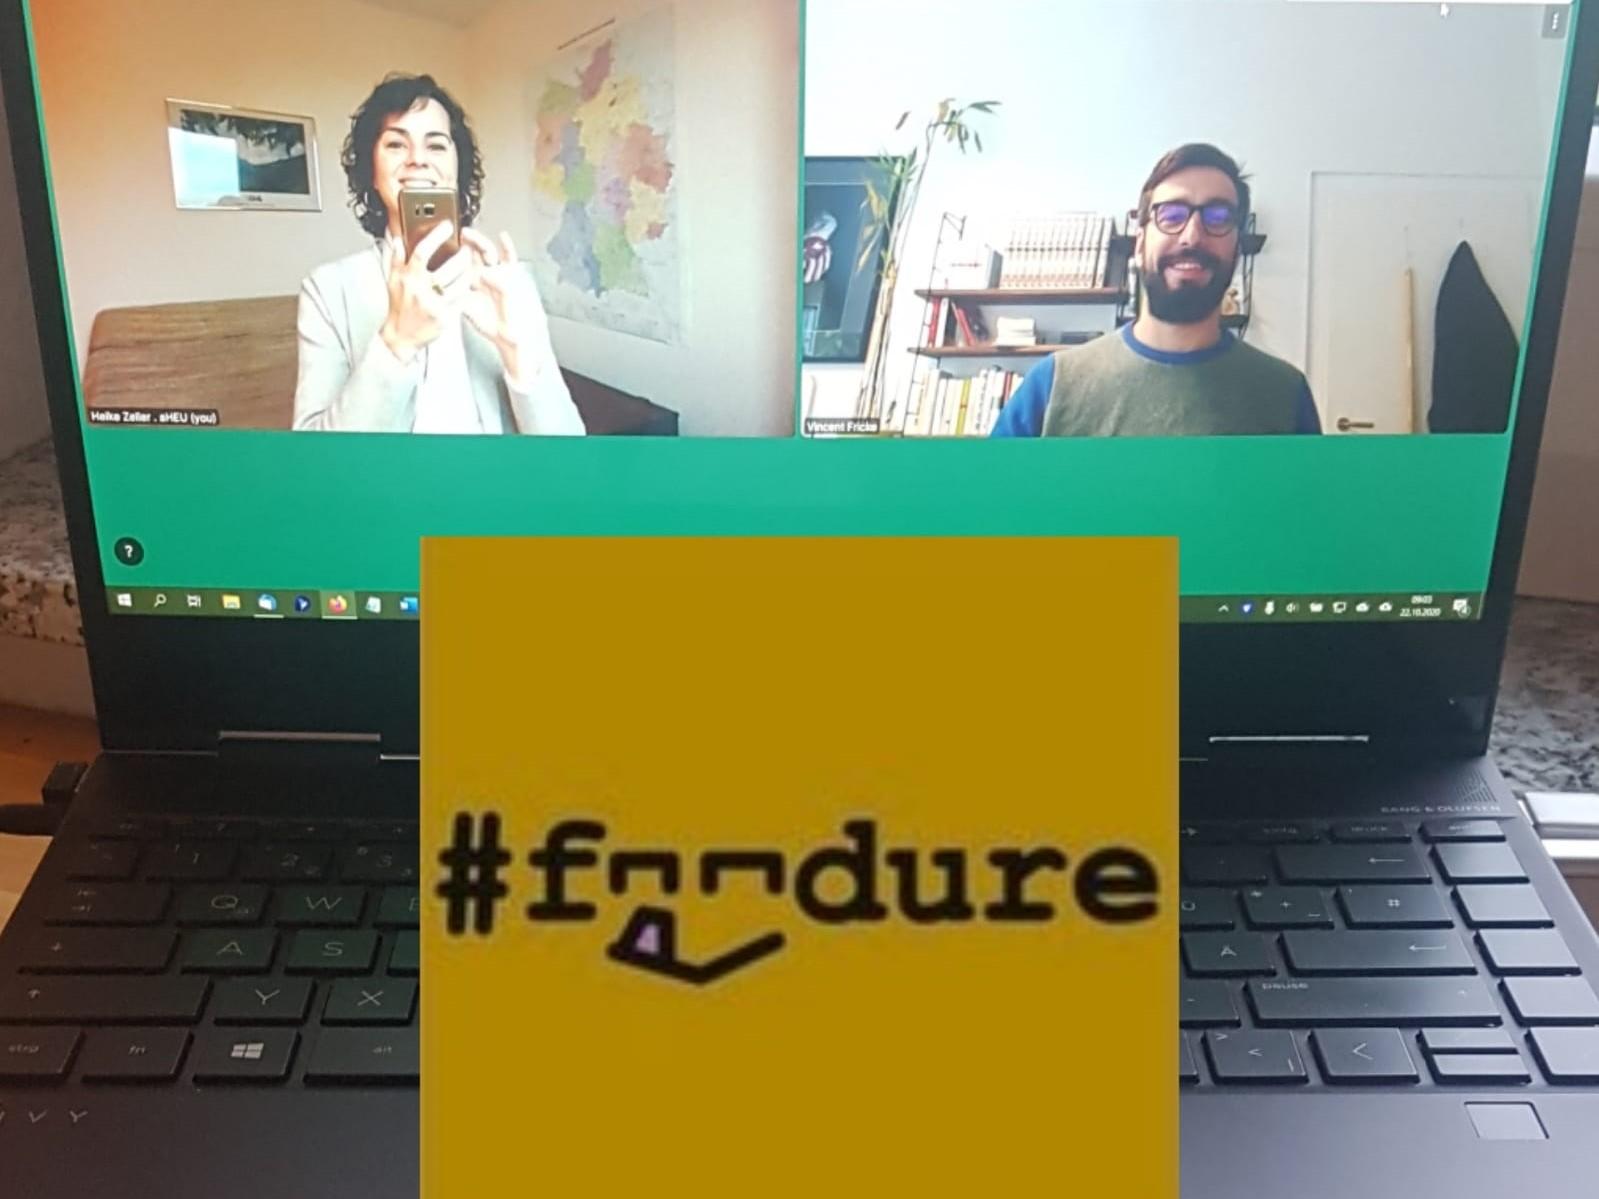 Computer mit Videokonferenz, Foodure, Heike Zeller, Vincent Fricke